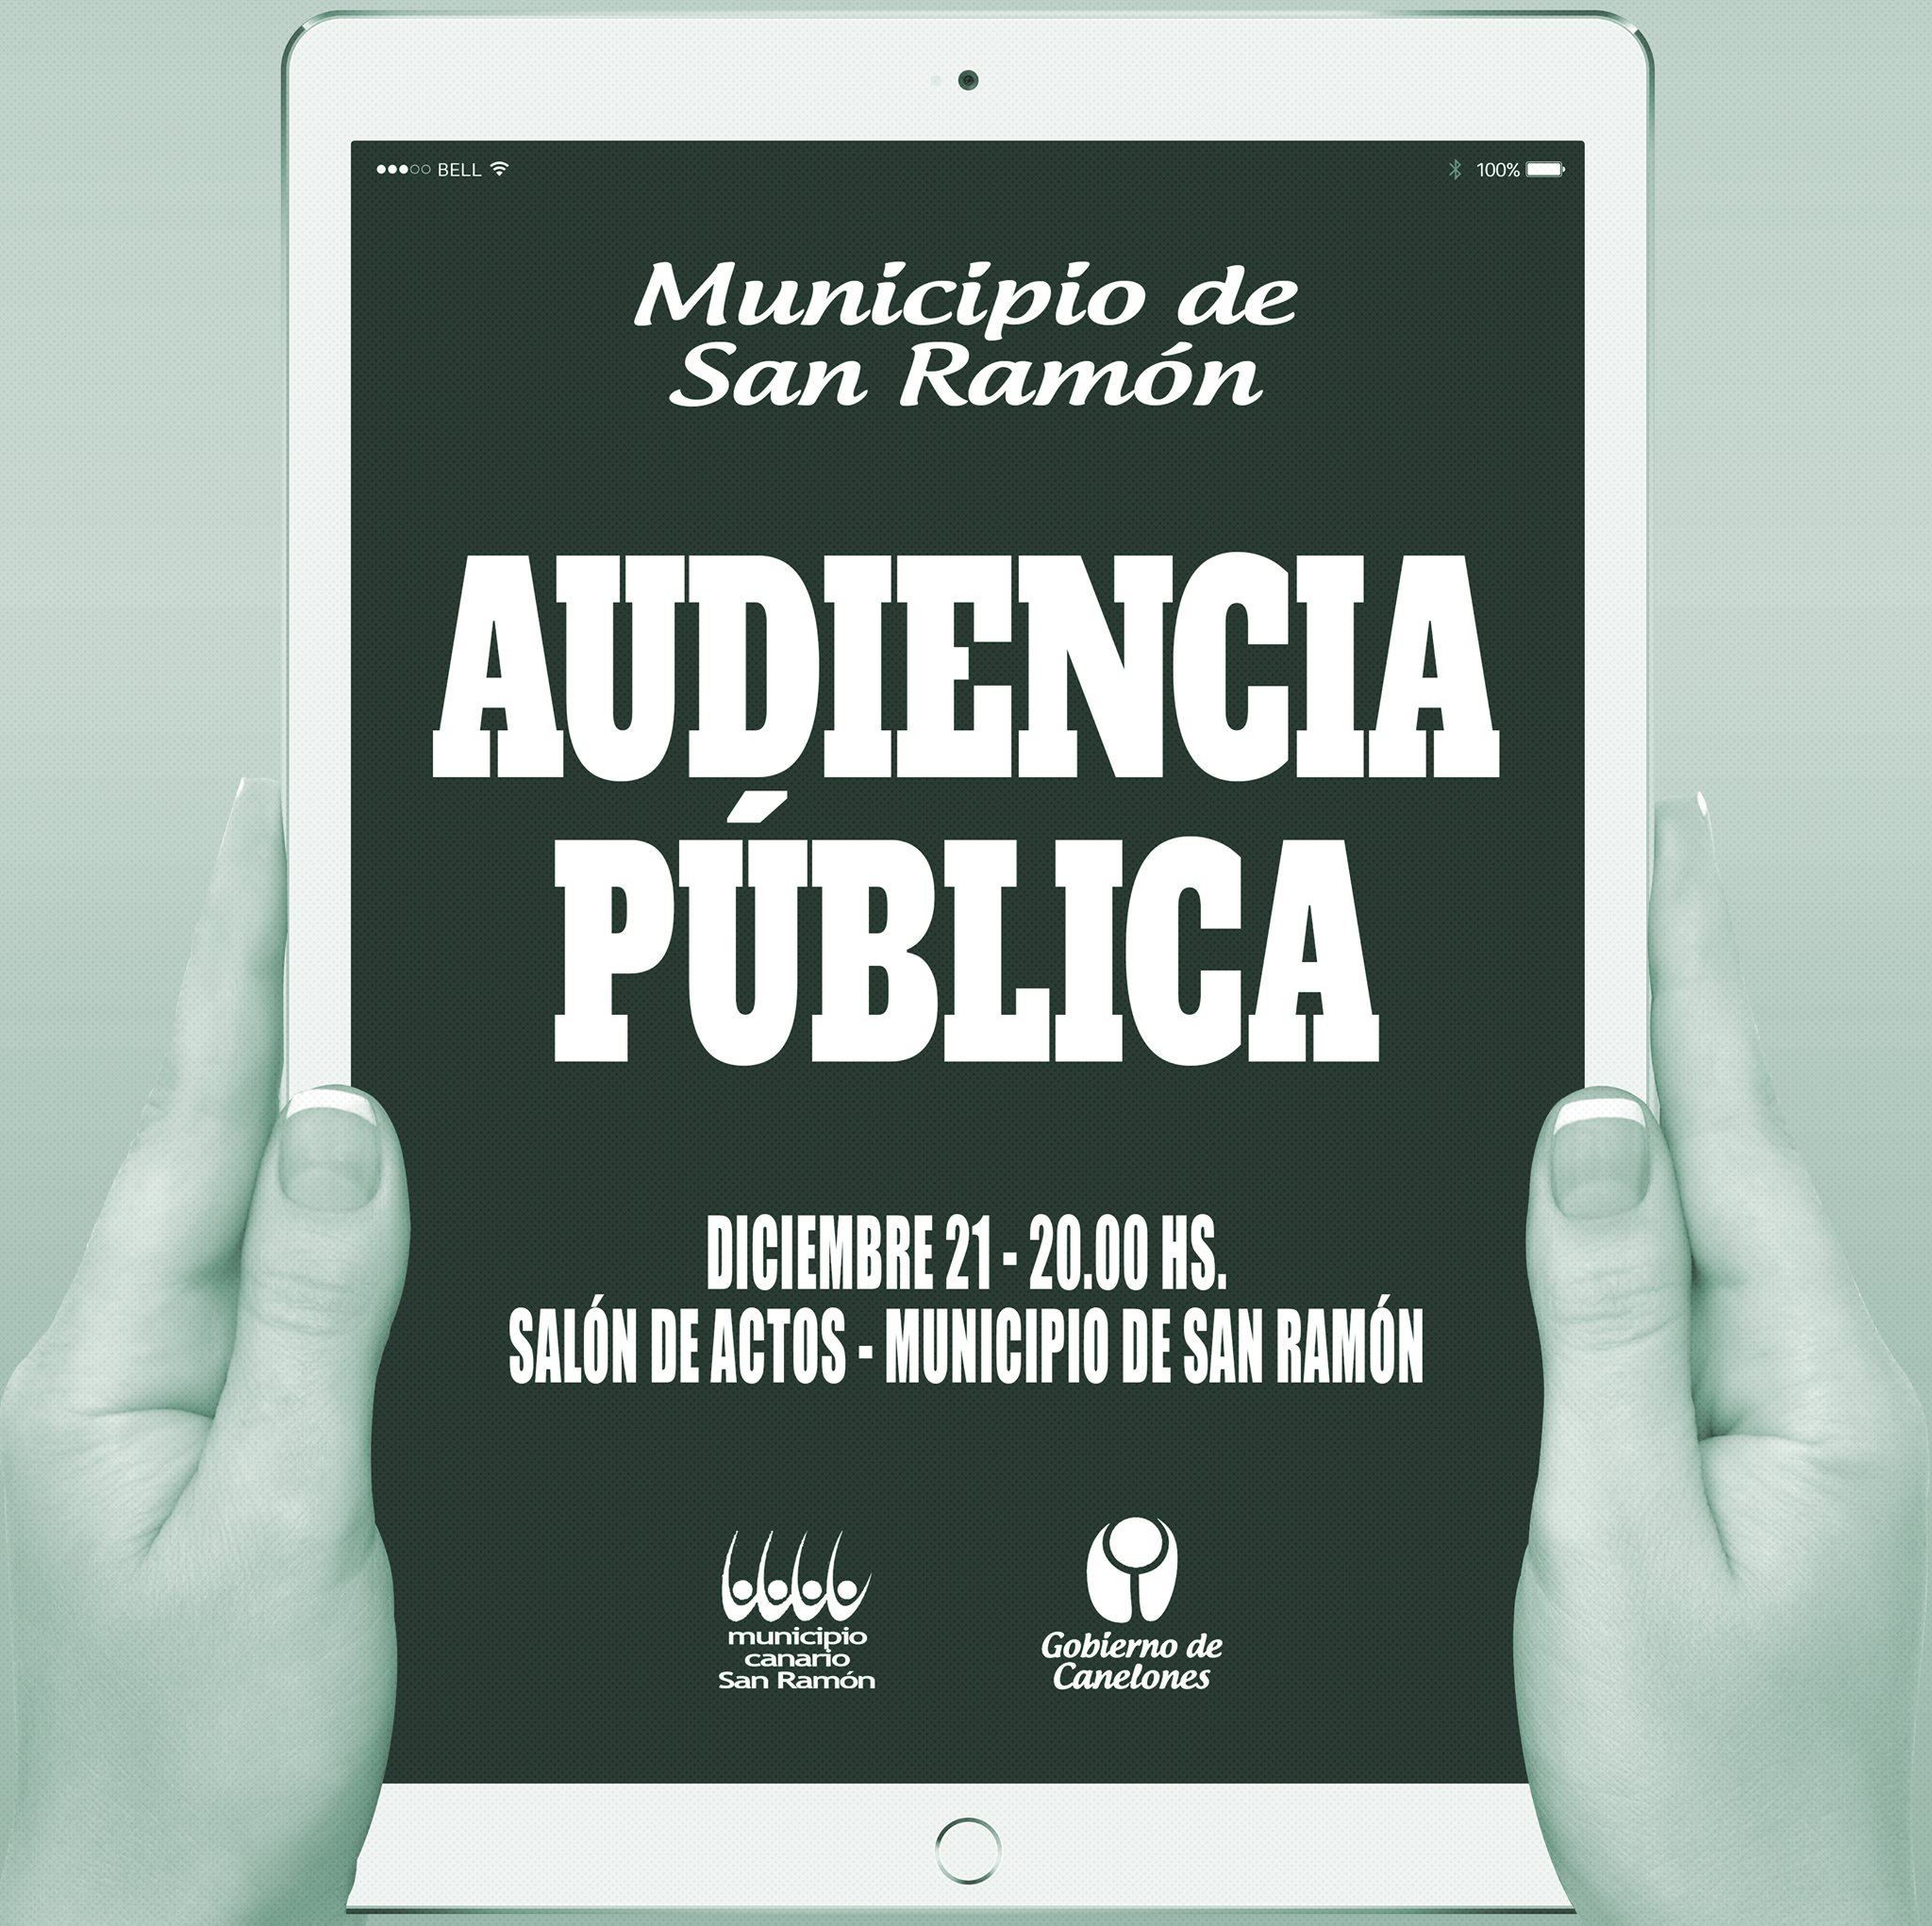 AFICHE AUDIENCIA PUBLICA